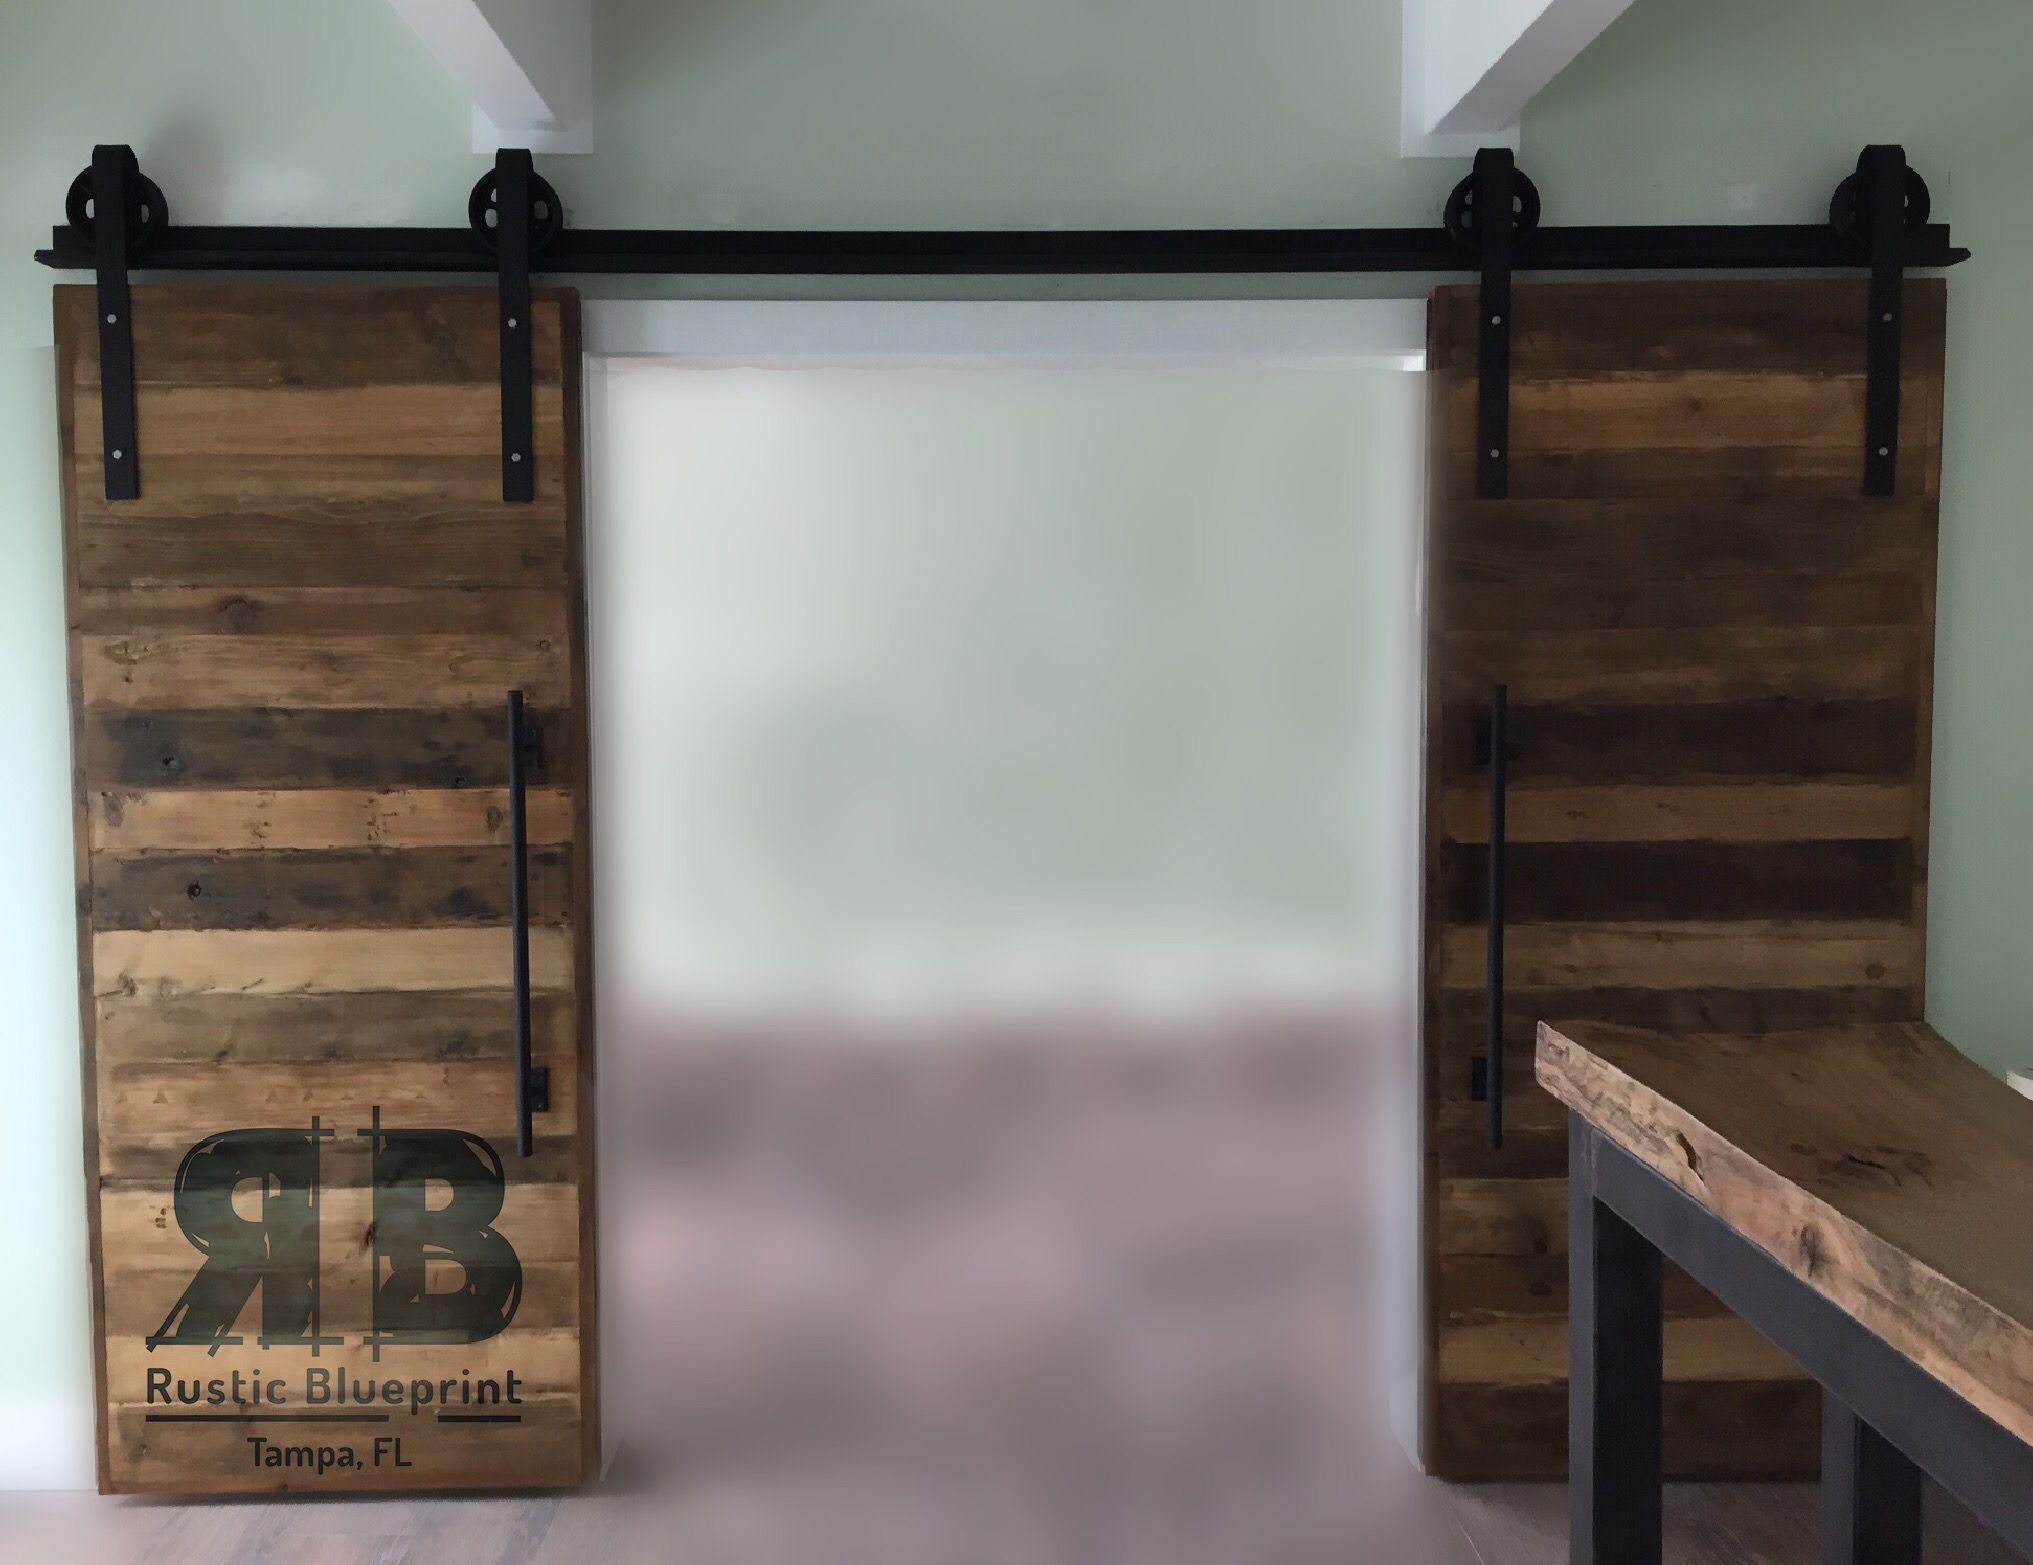 Reclaimed wood barn doors built by rustic blueprint tampa fl reclaimed wood barn doors built by rustic blueprint tampa fl malvernweather Choice Image